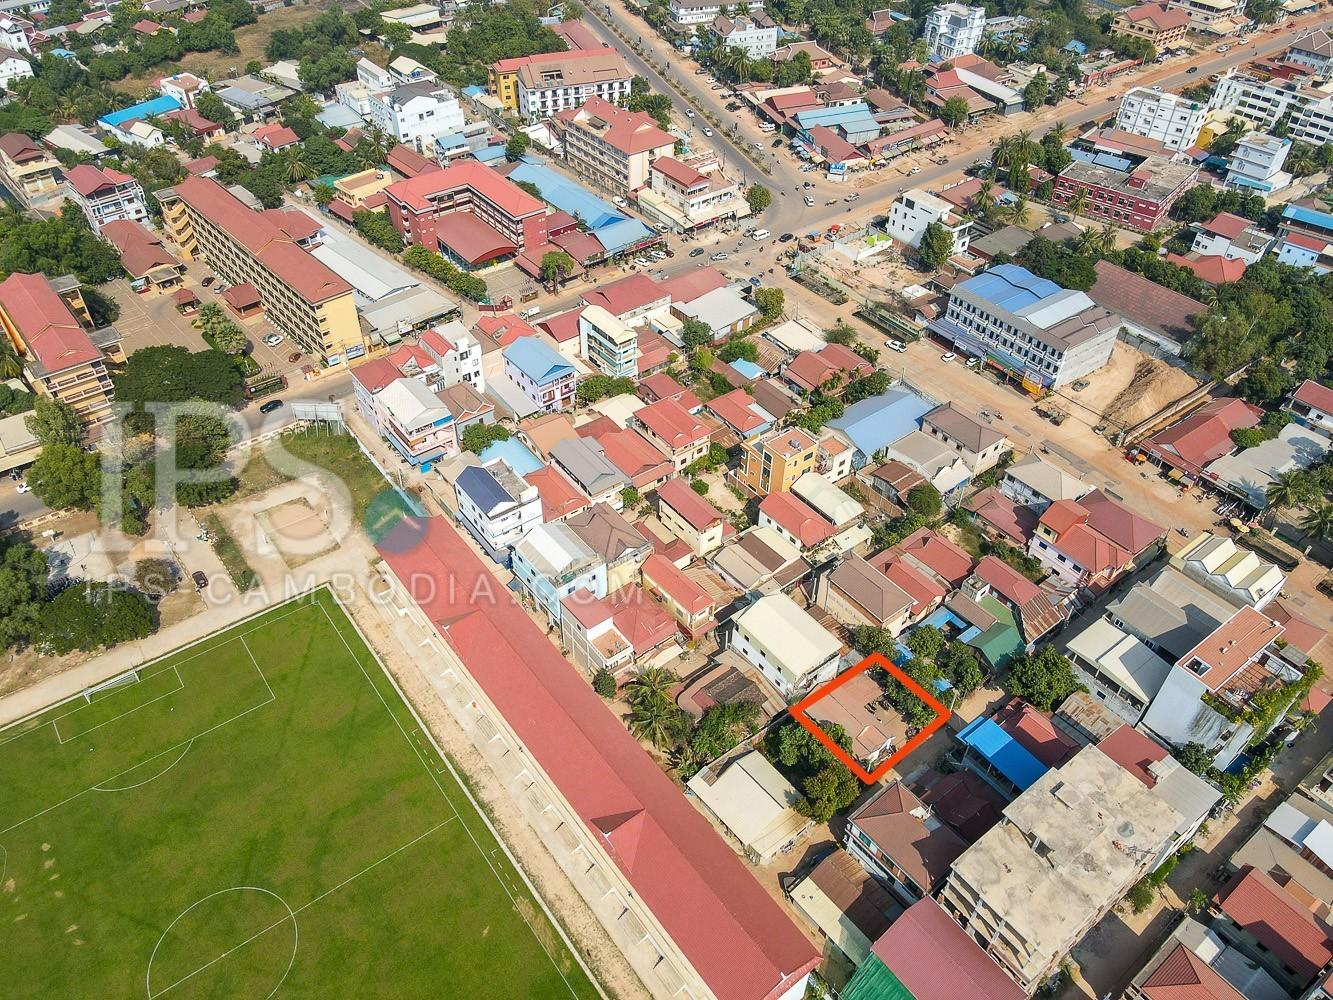 286 Sqm Land For Sale - Sala Kamreuk, Siem Reap